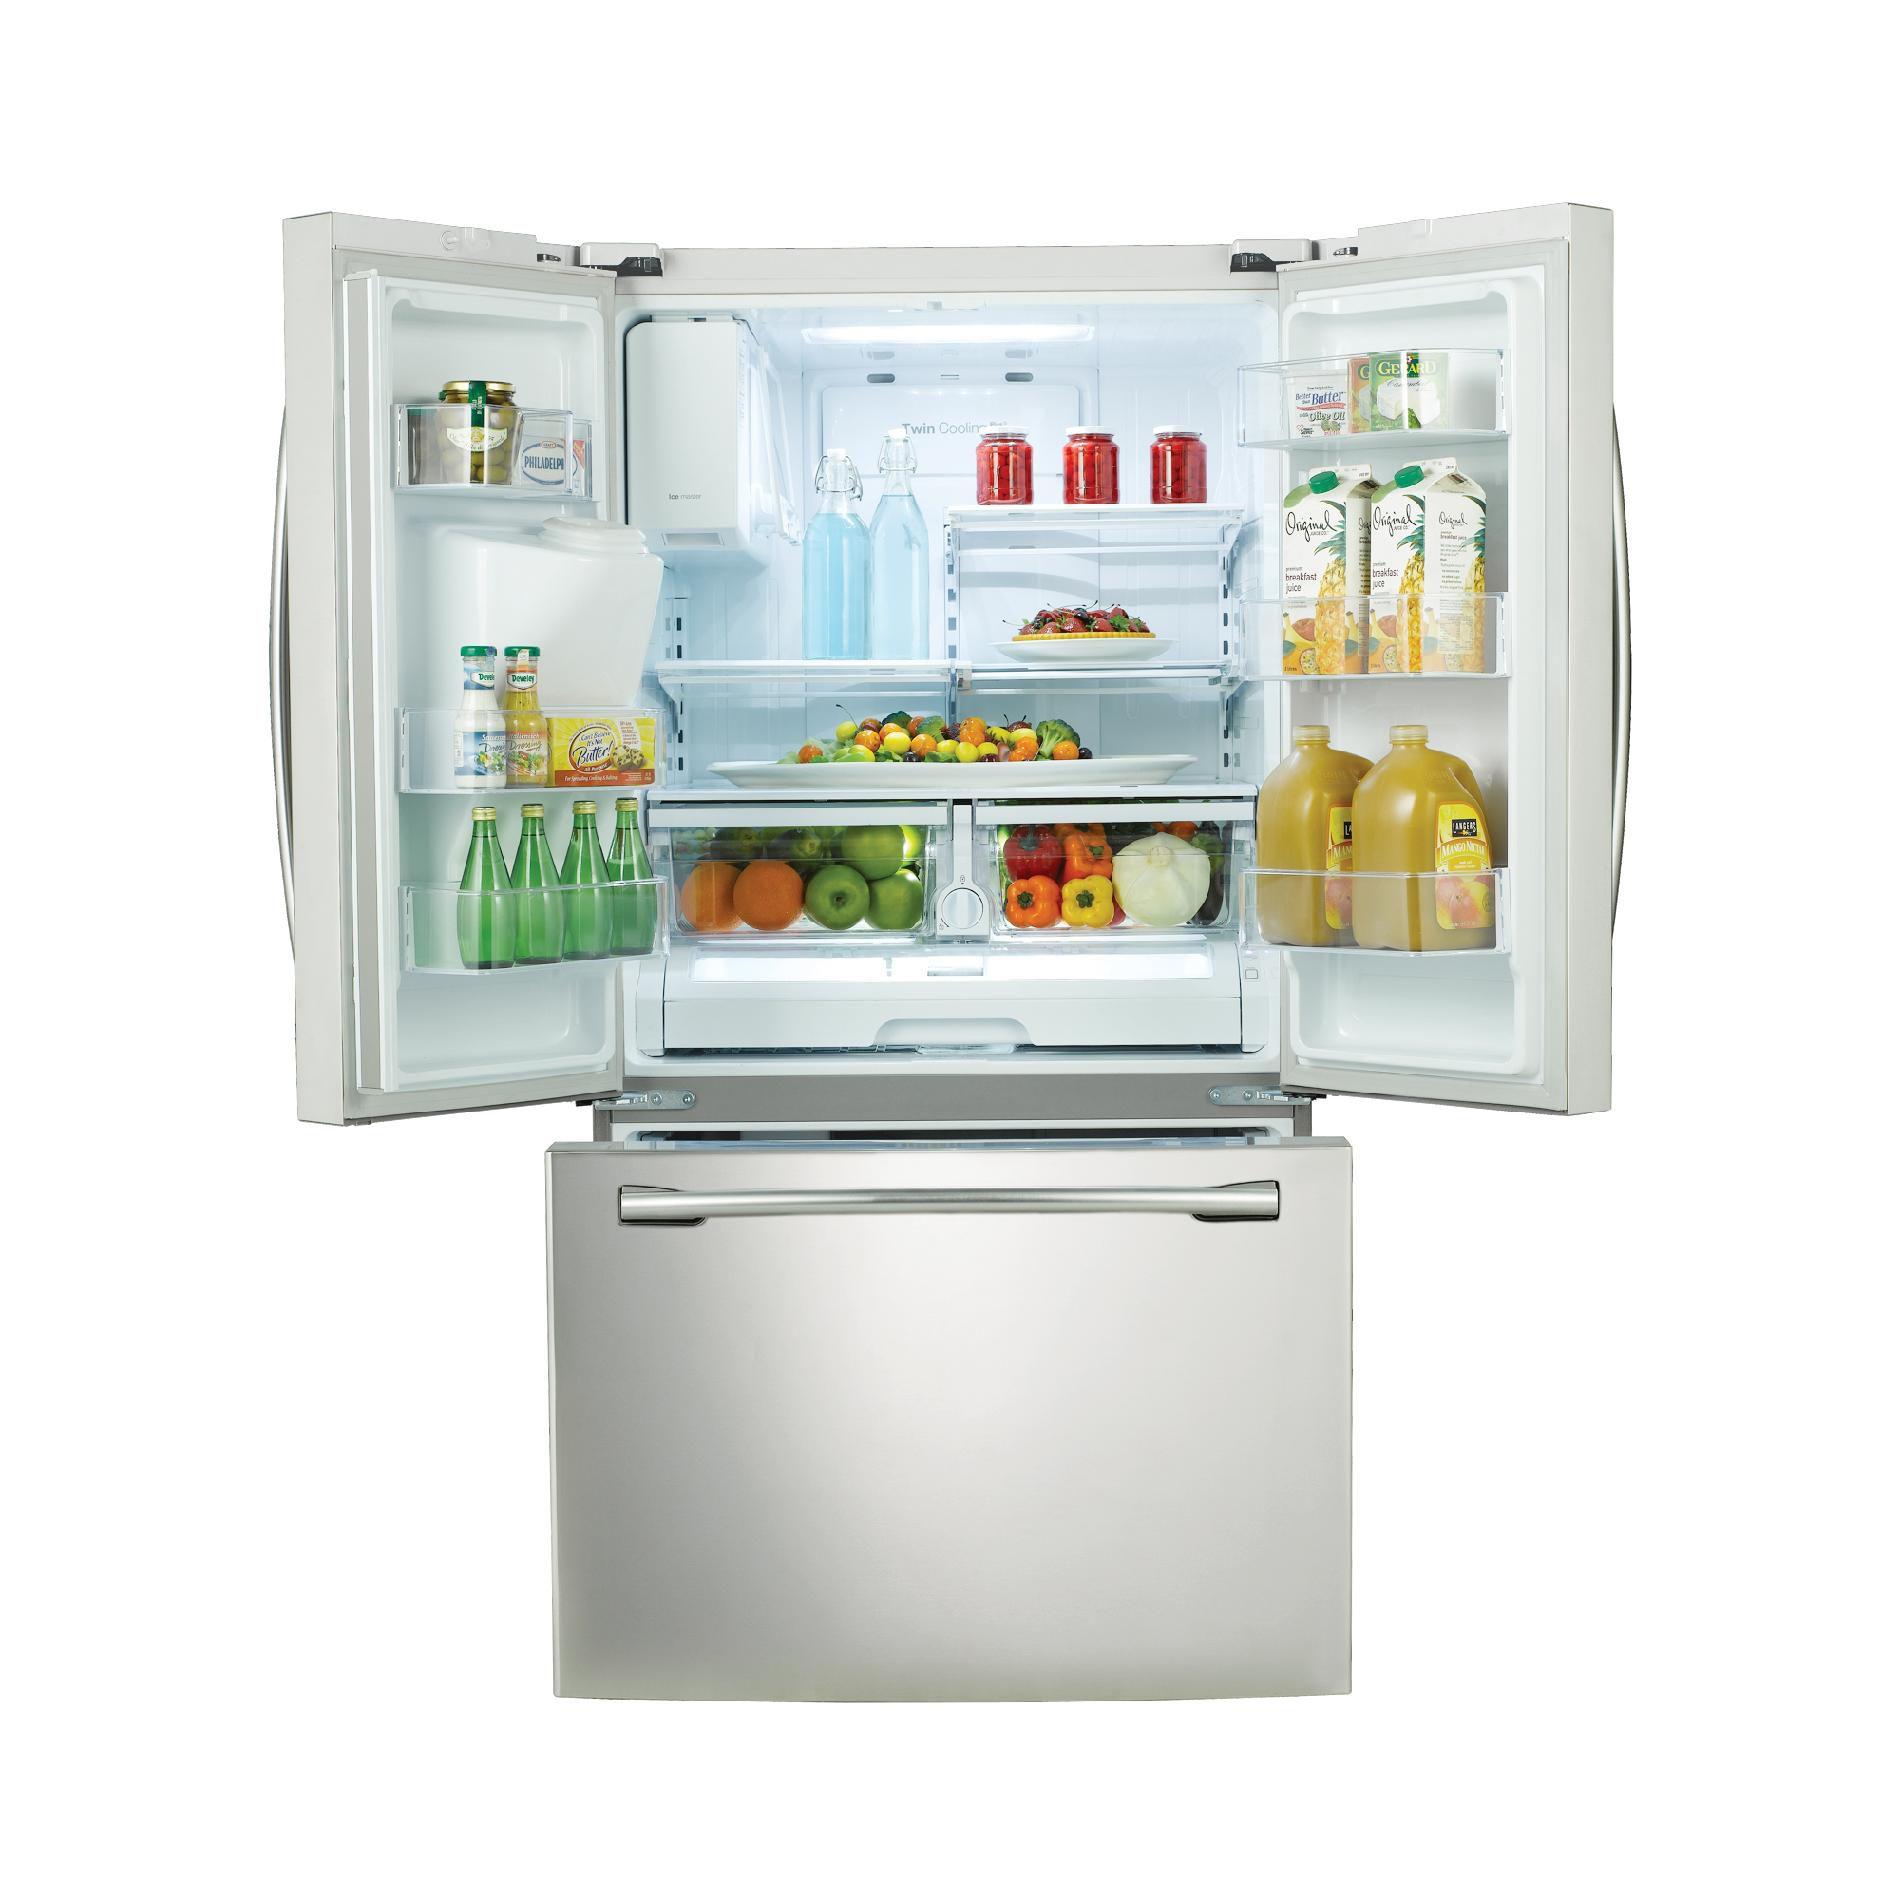 Samsung 26  cu. ft. French Door w/ External Water & Ice Dispenser - White